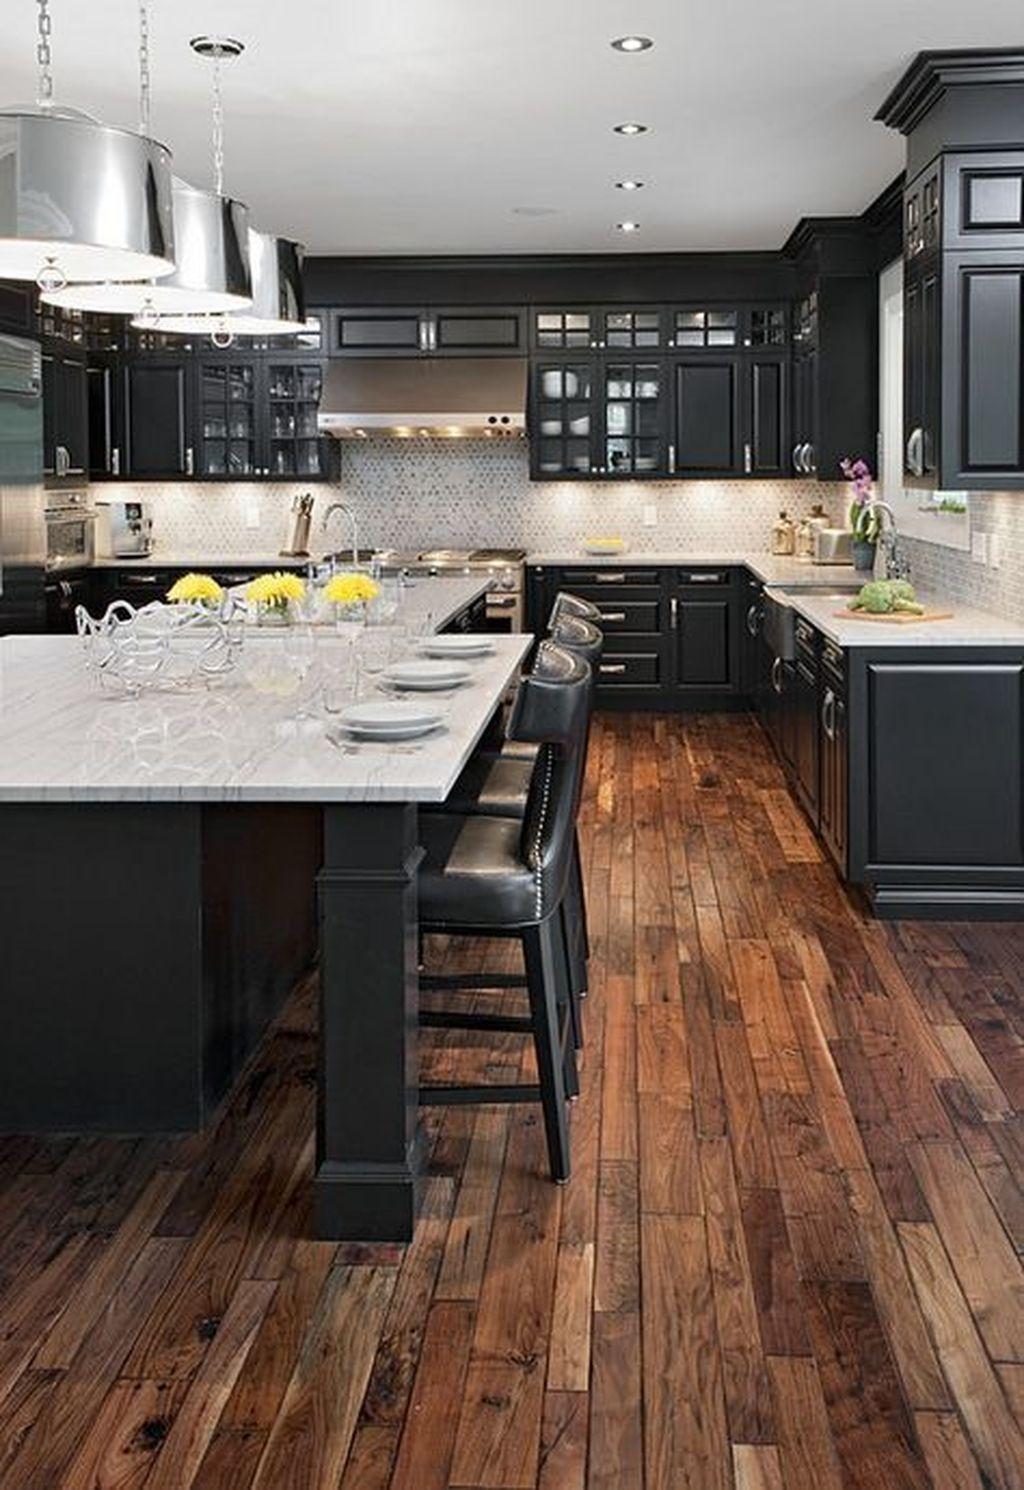 50 black kitchen design ideas with white color accent rustic farmhouse kitchen home decor on kitchen ideas with dark cabinets id=56116